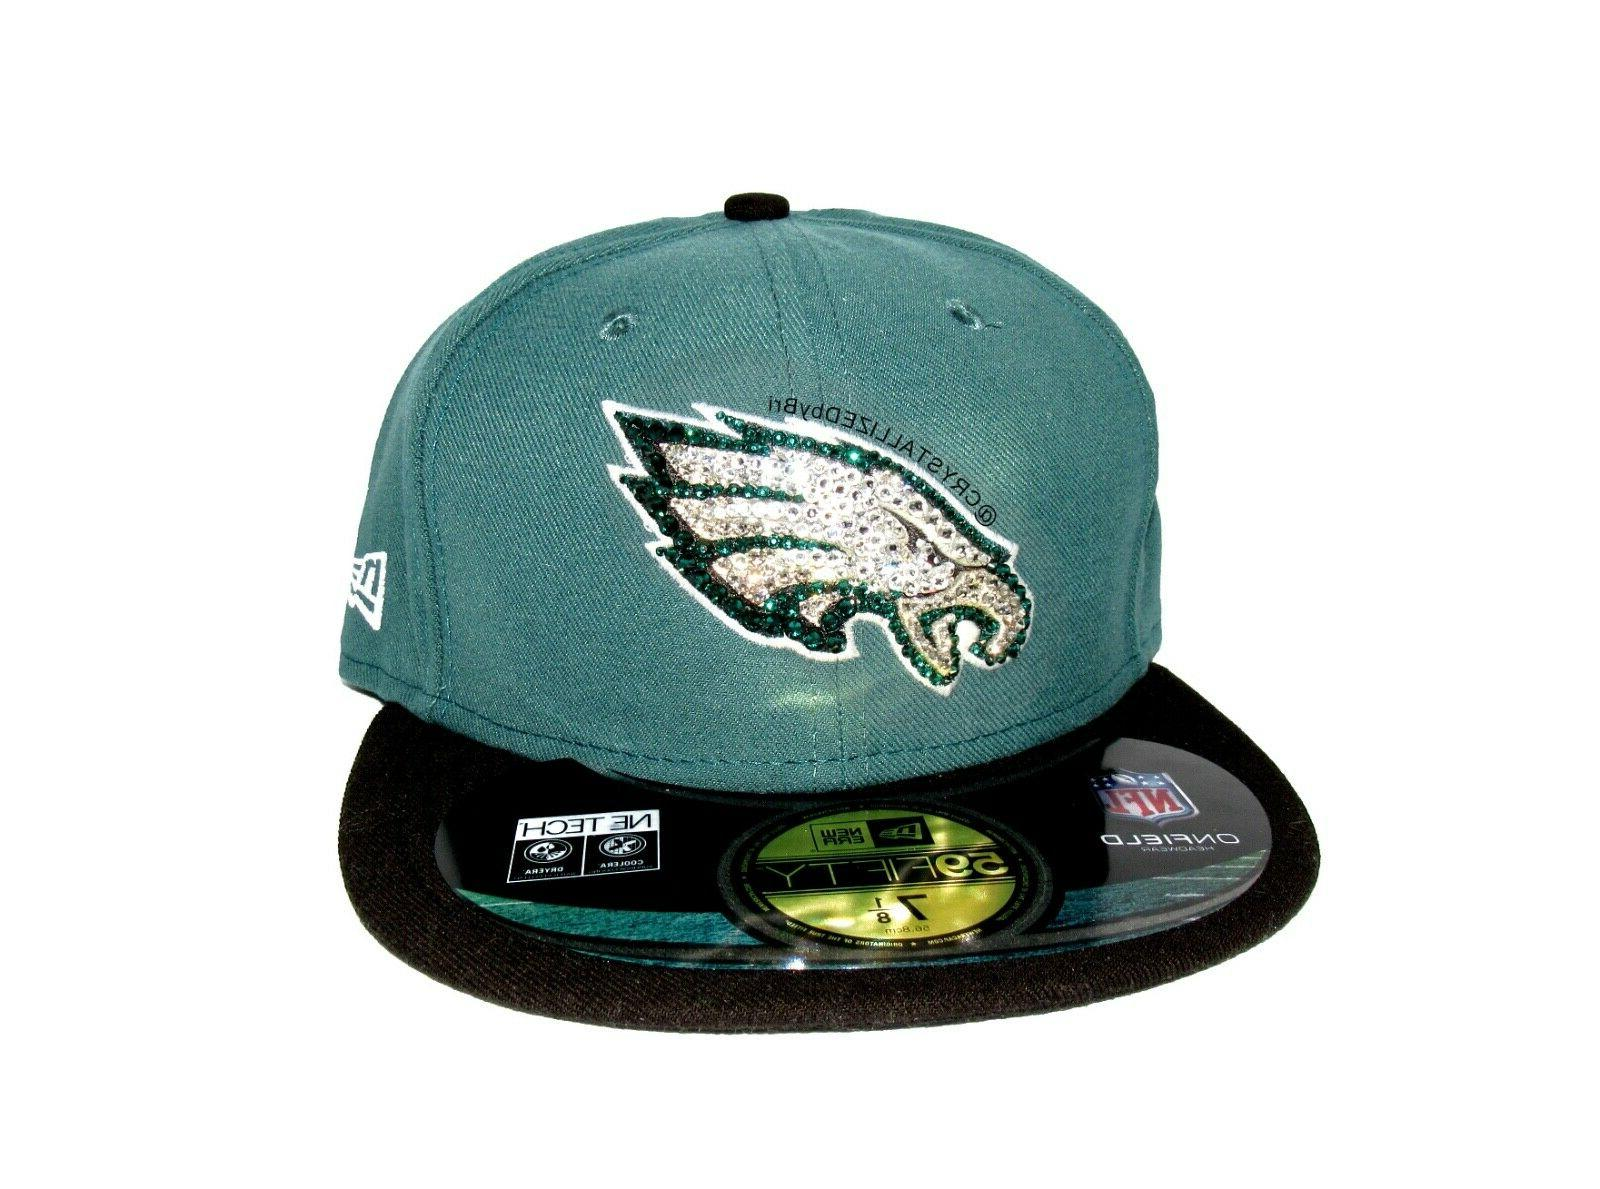 nfl crystallized hat snapback baseball cap w